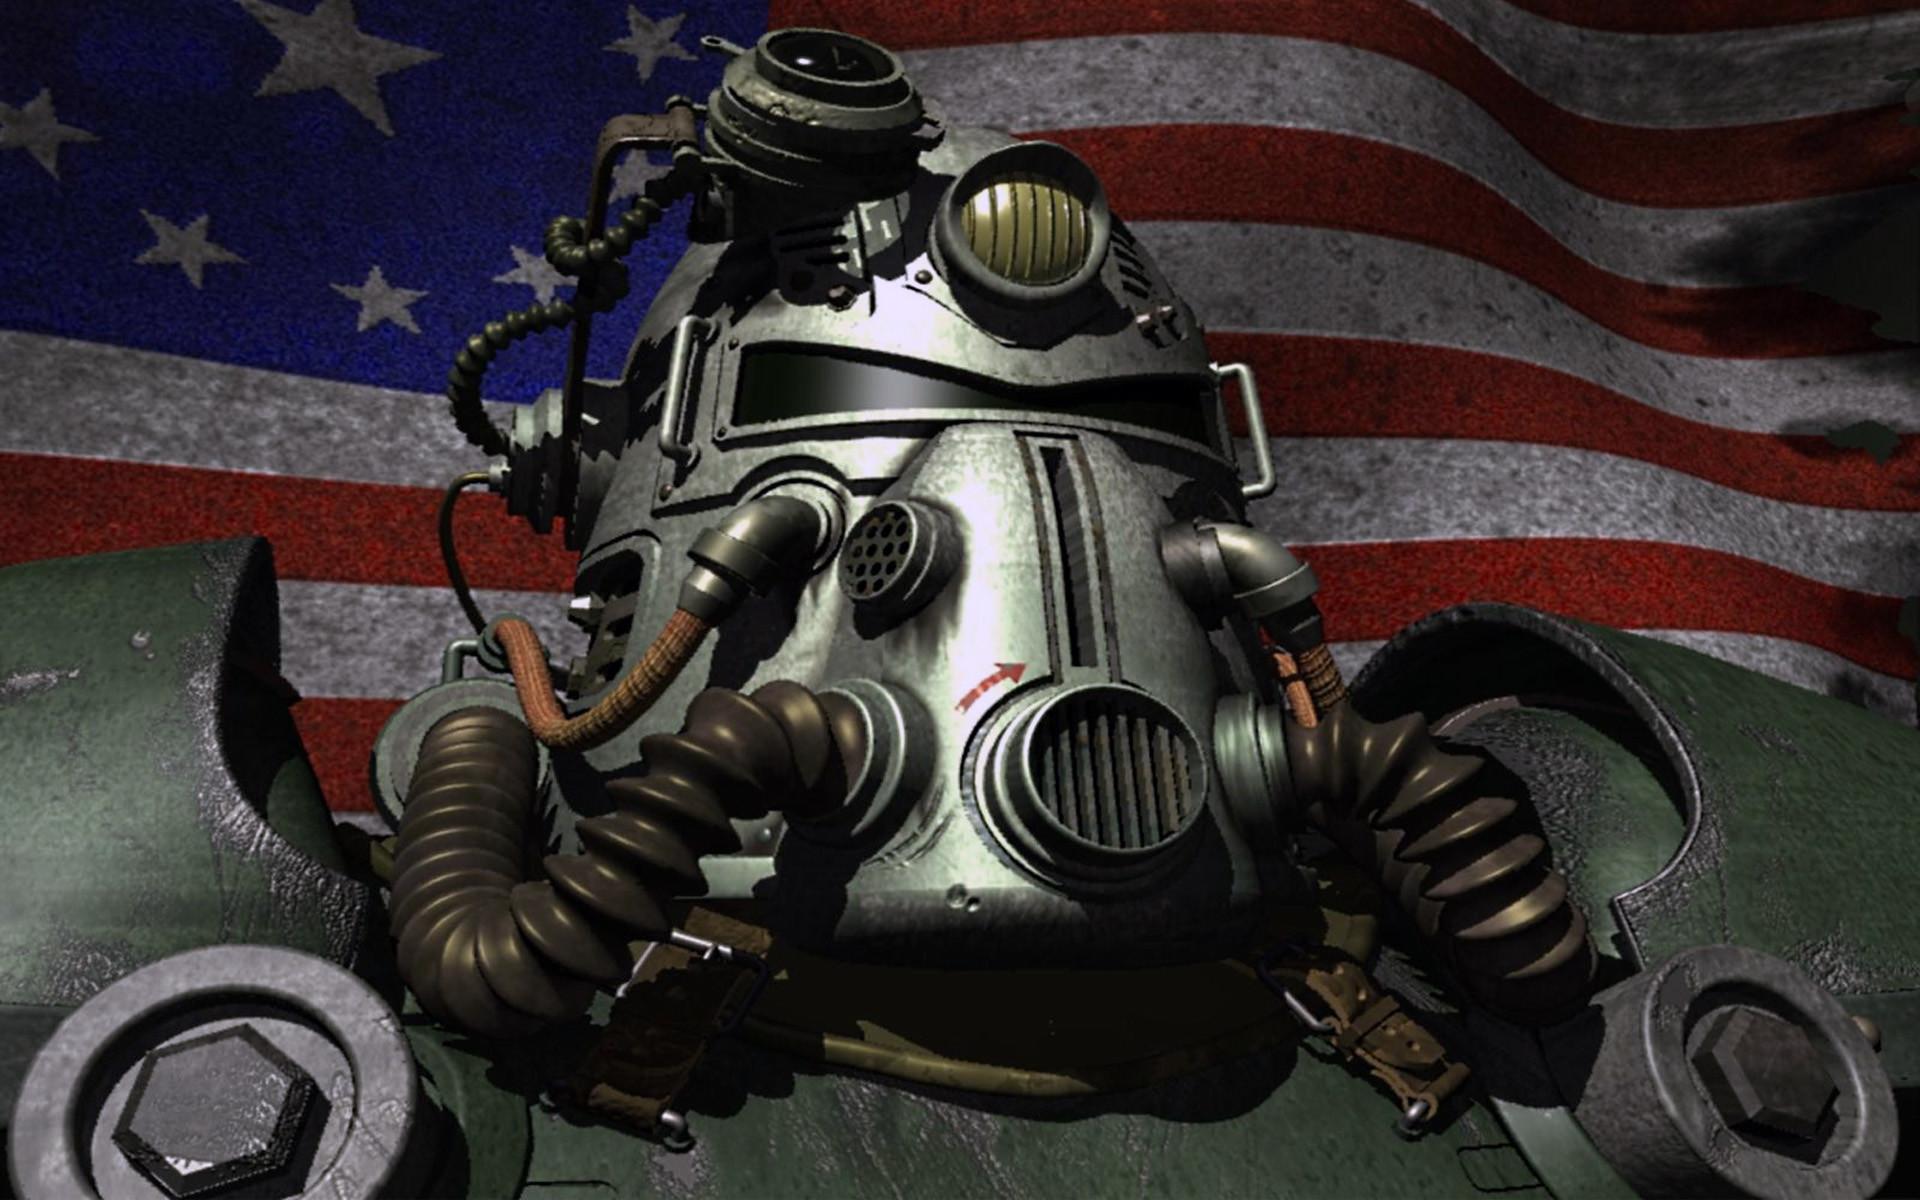 Fallout New Vegas Helmet Armor Wallpaper ~ Fallout New .